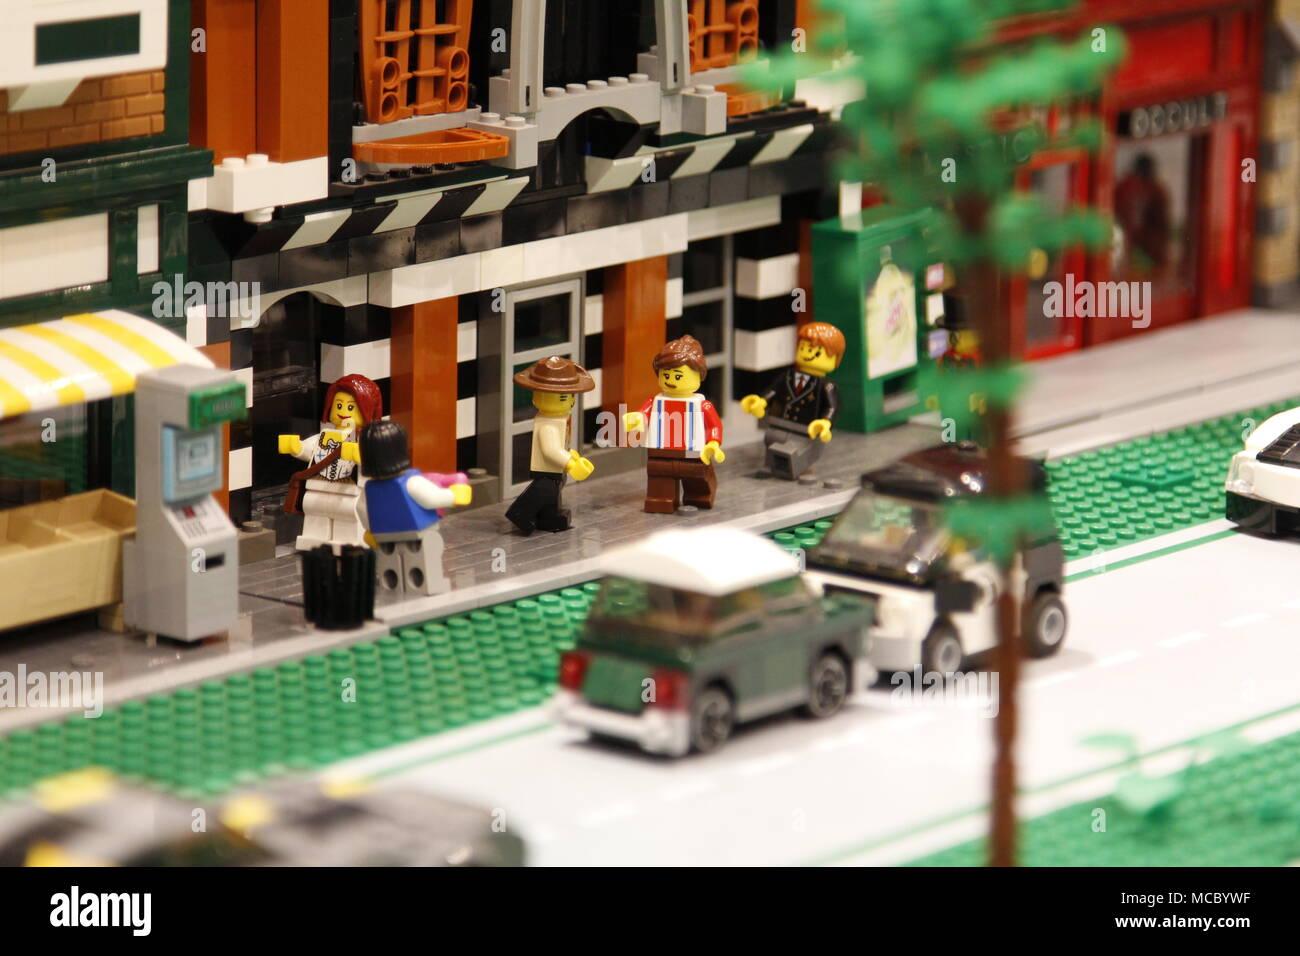 Lego Street Scene Diorama - Stock Image